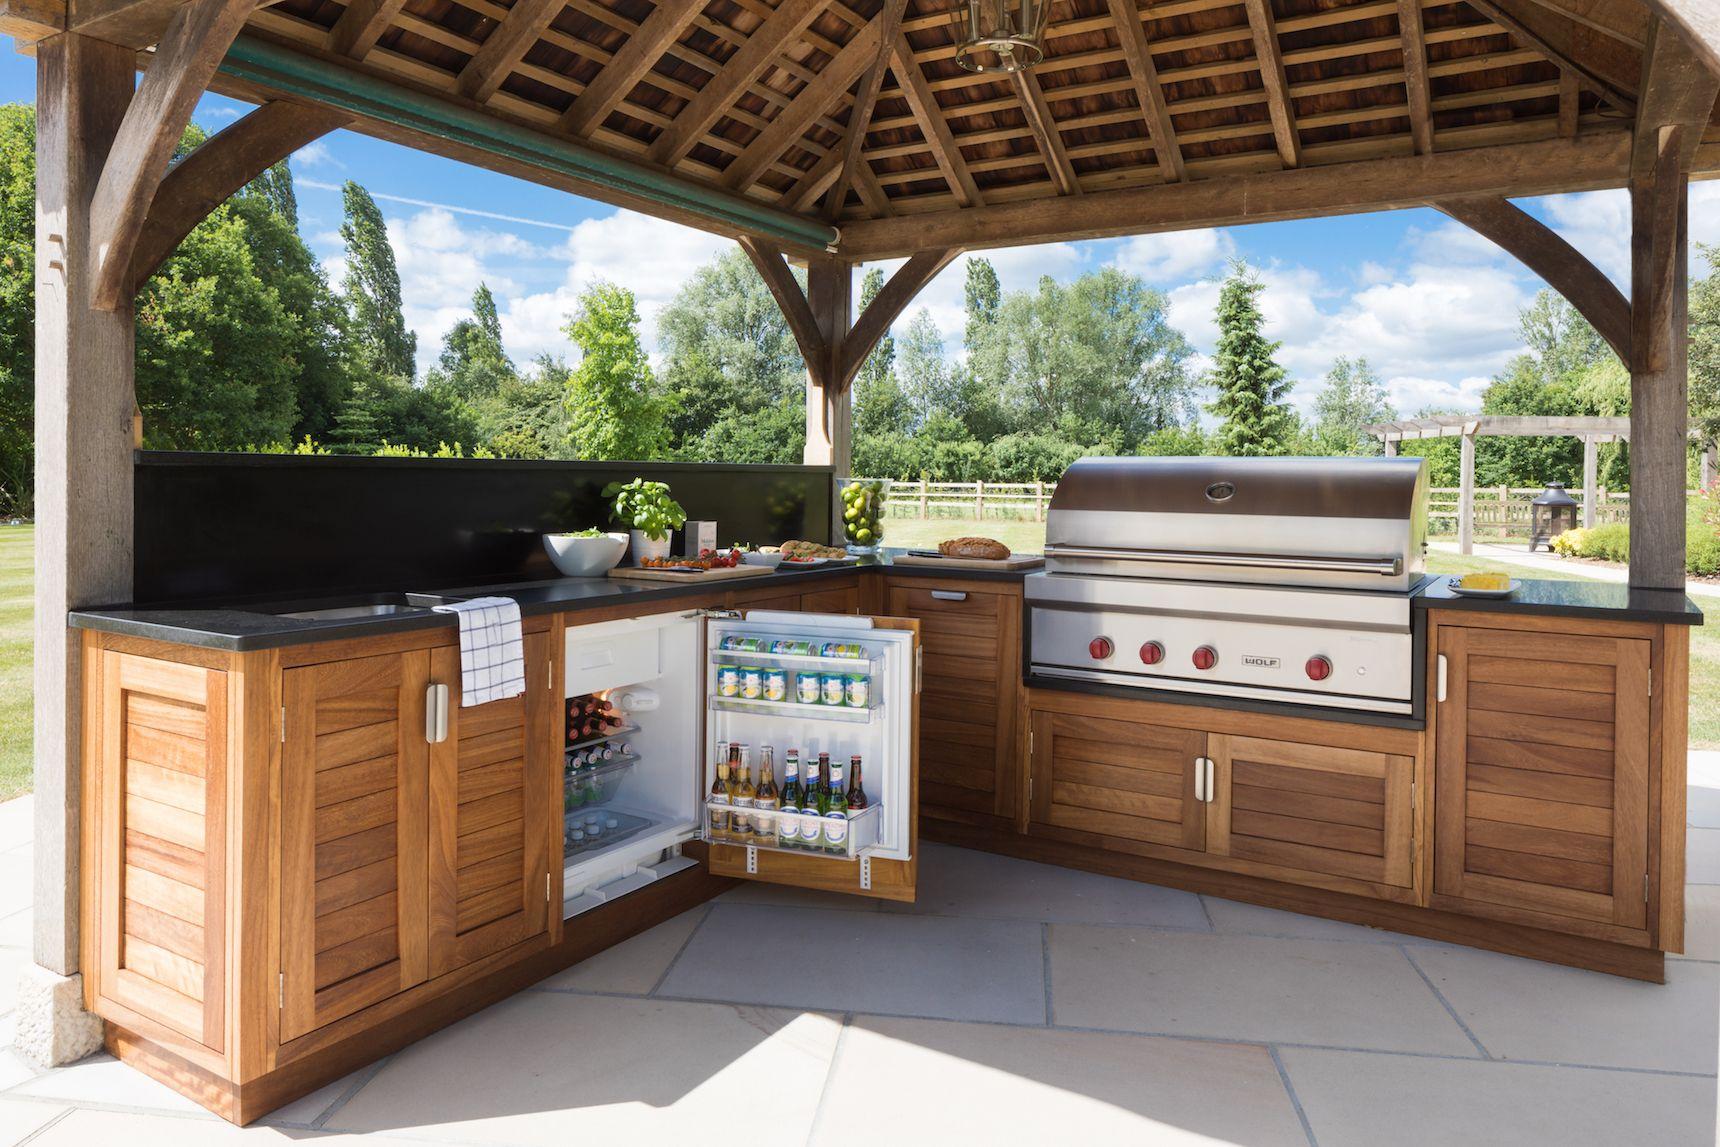 Orchard house humphrey munson kitchens outdoor kitchen